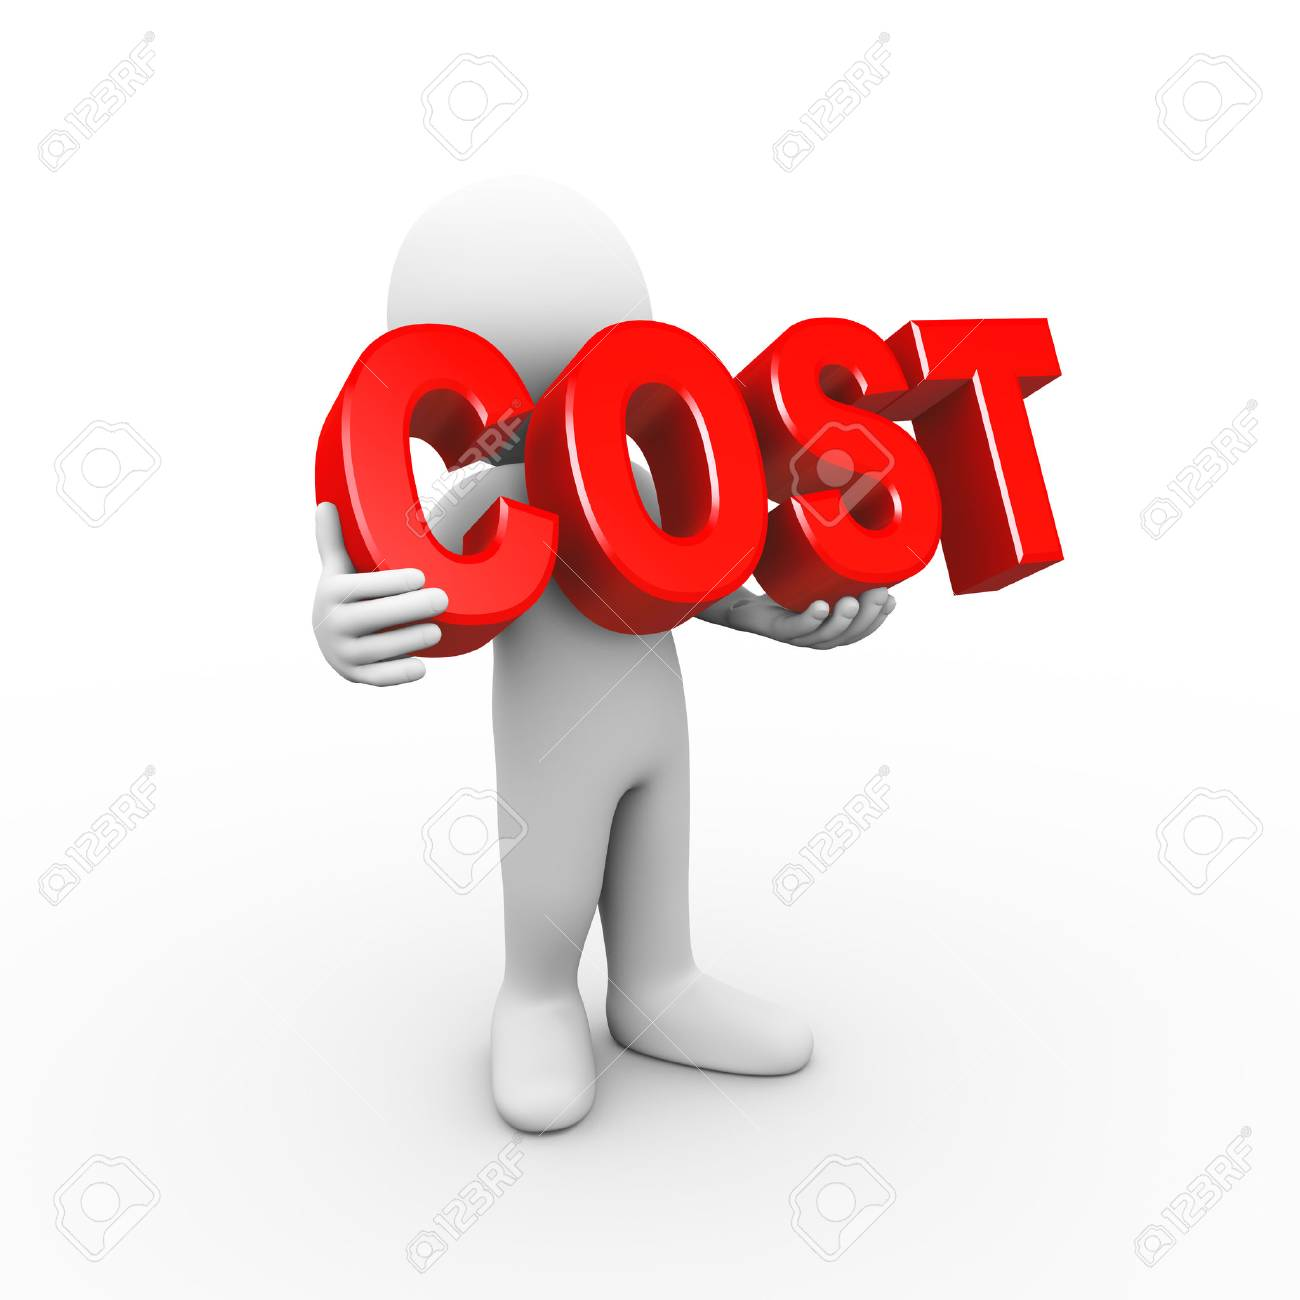 cost of living isle of man vs uk